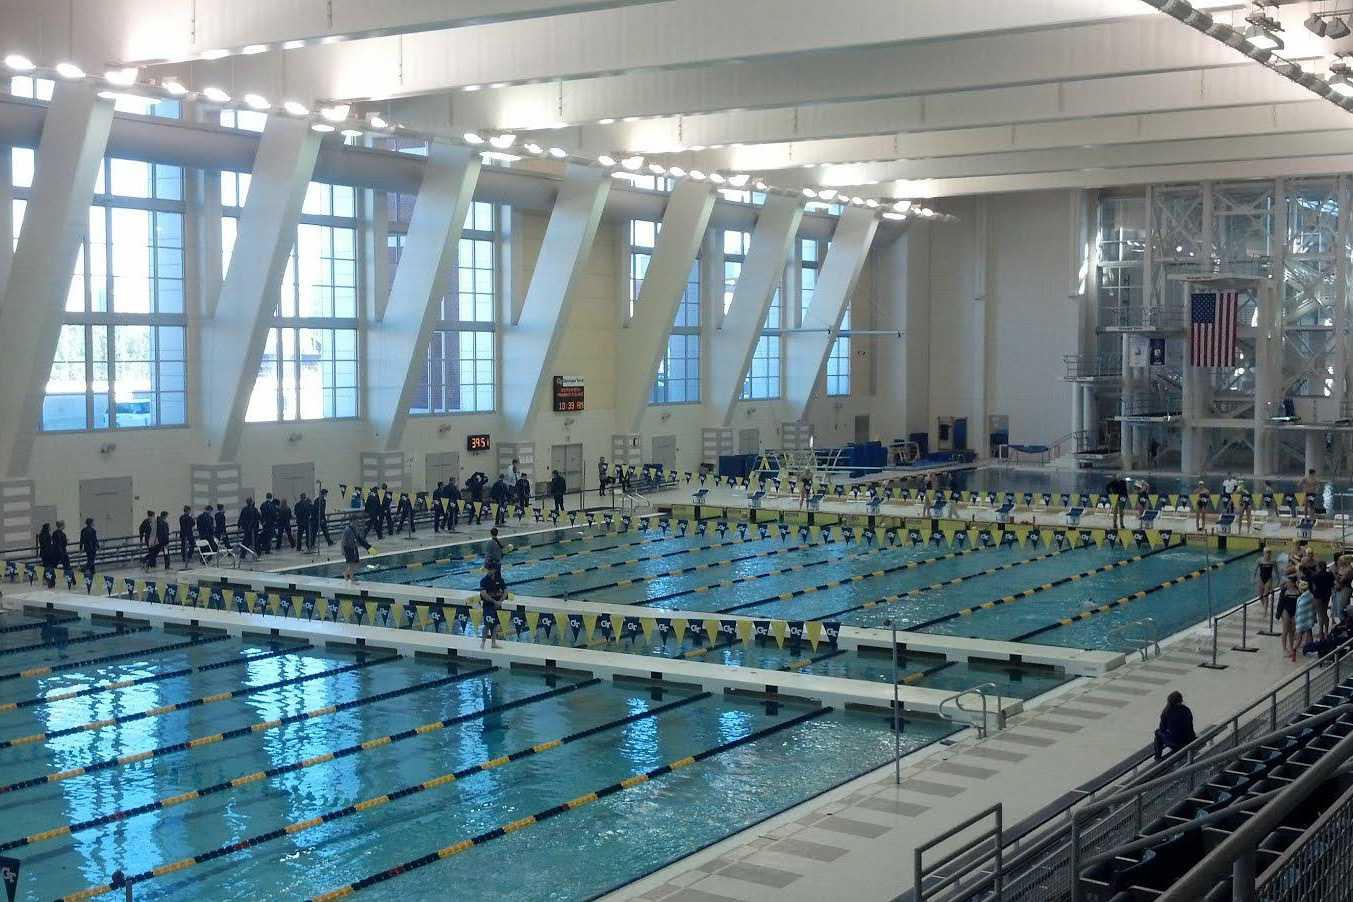 Emory University pool